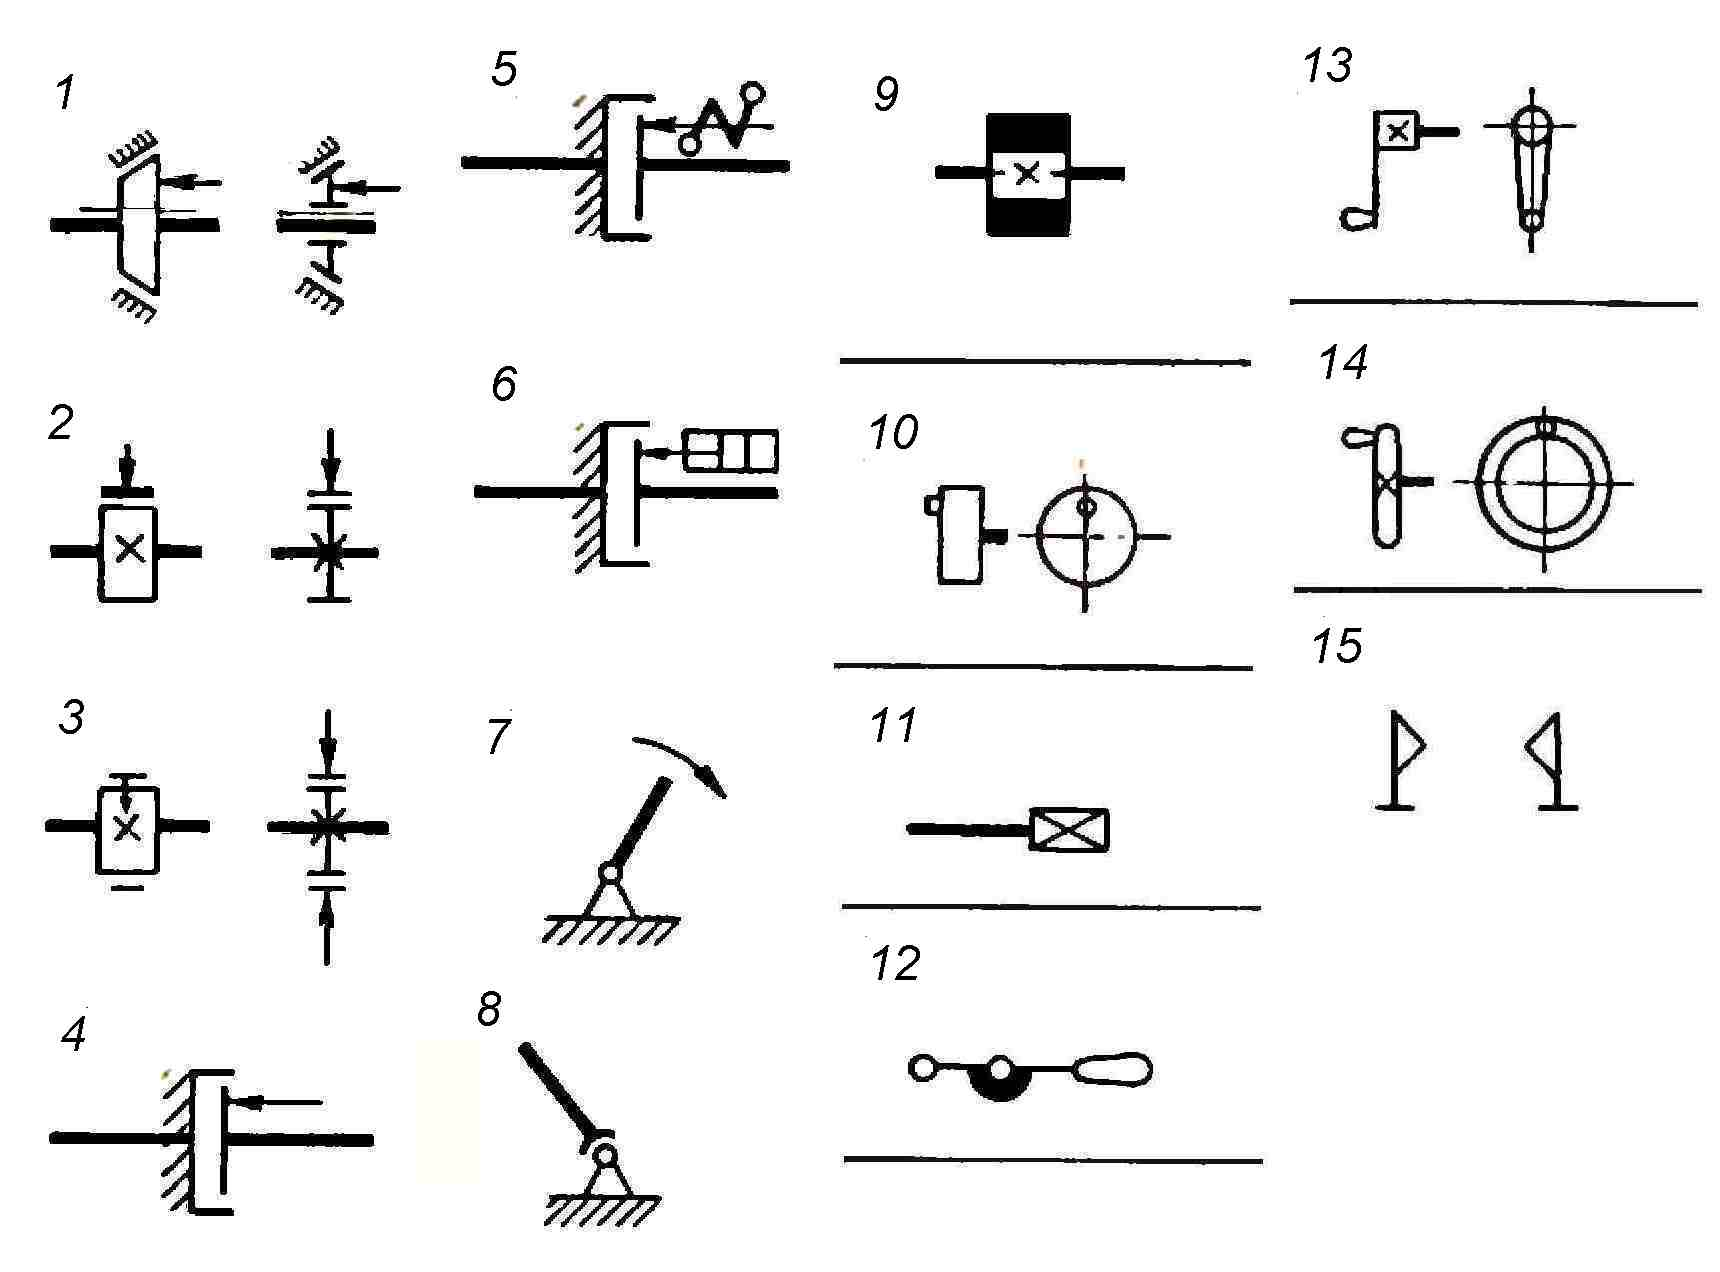 Clutch Schematic Symbol